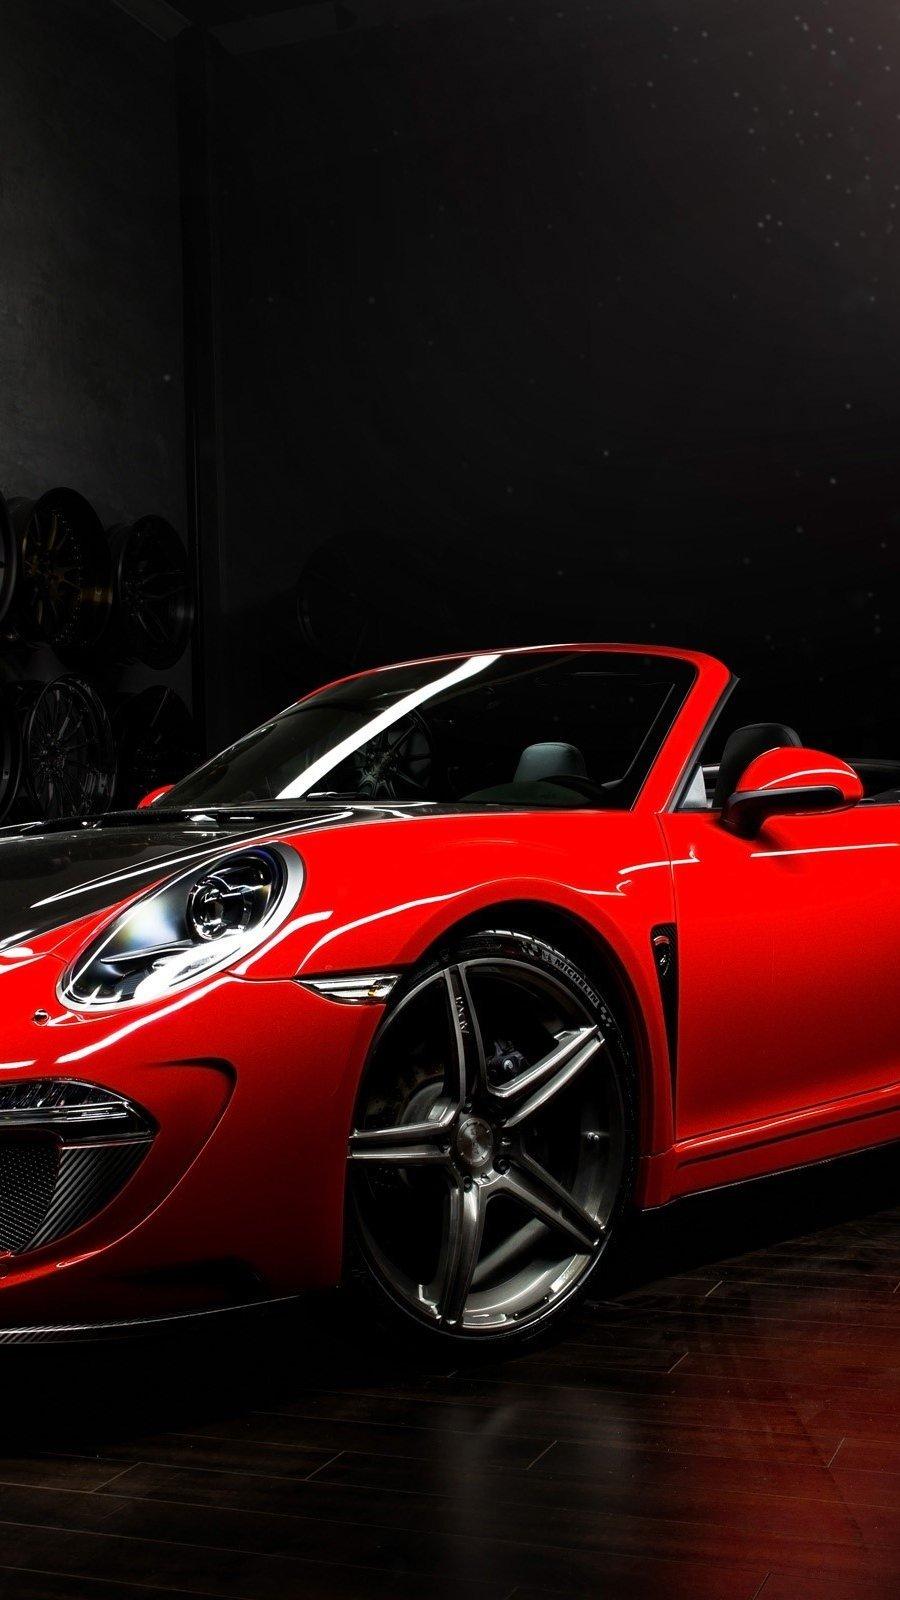 Fondos de pantalla Porsche 991 Carrera Cabriolet Stinger Vertical